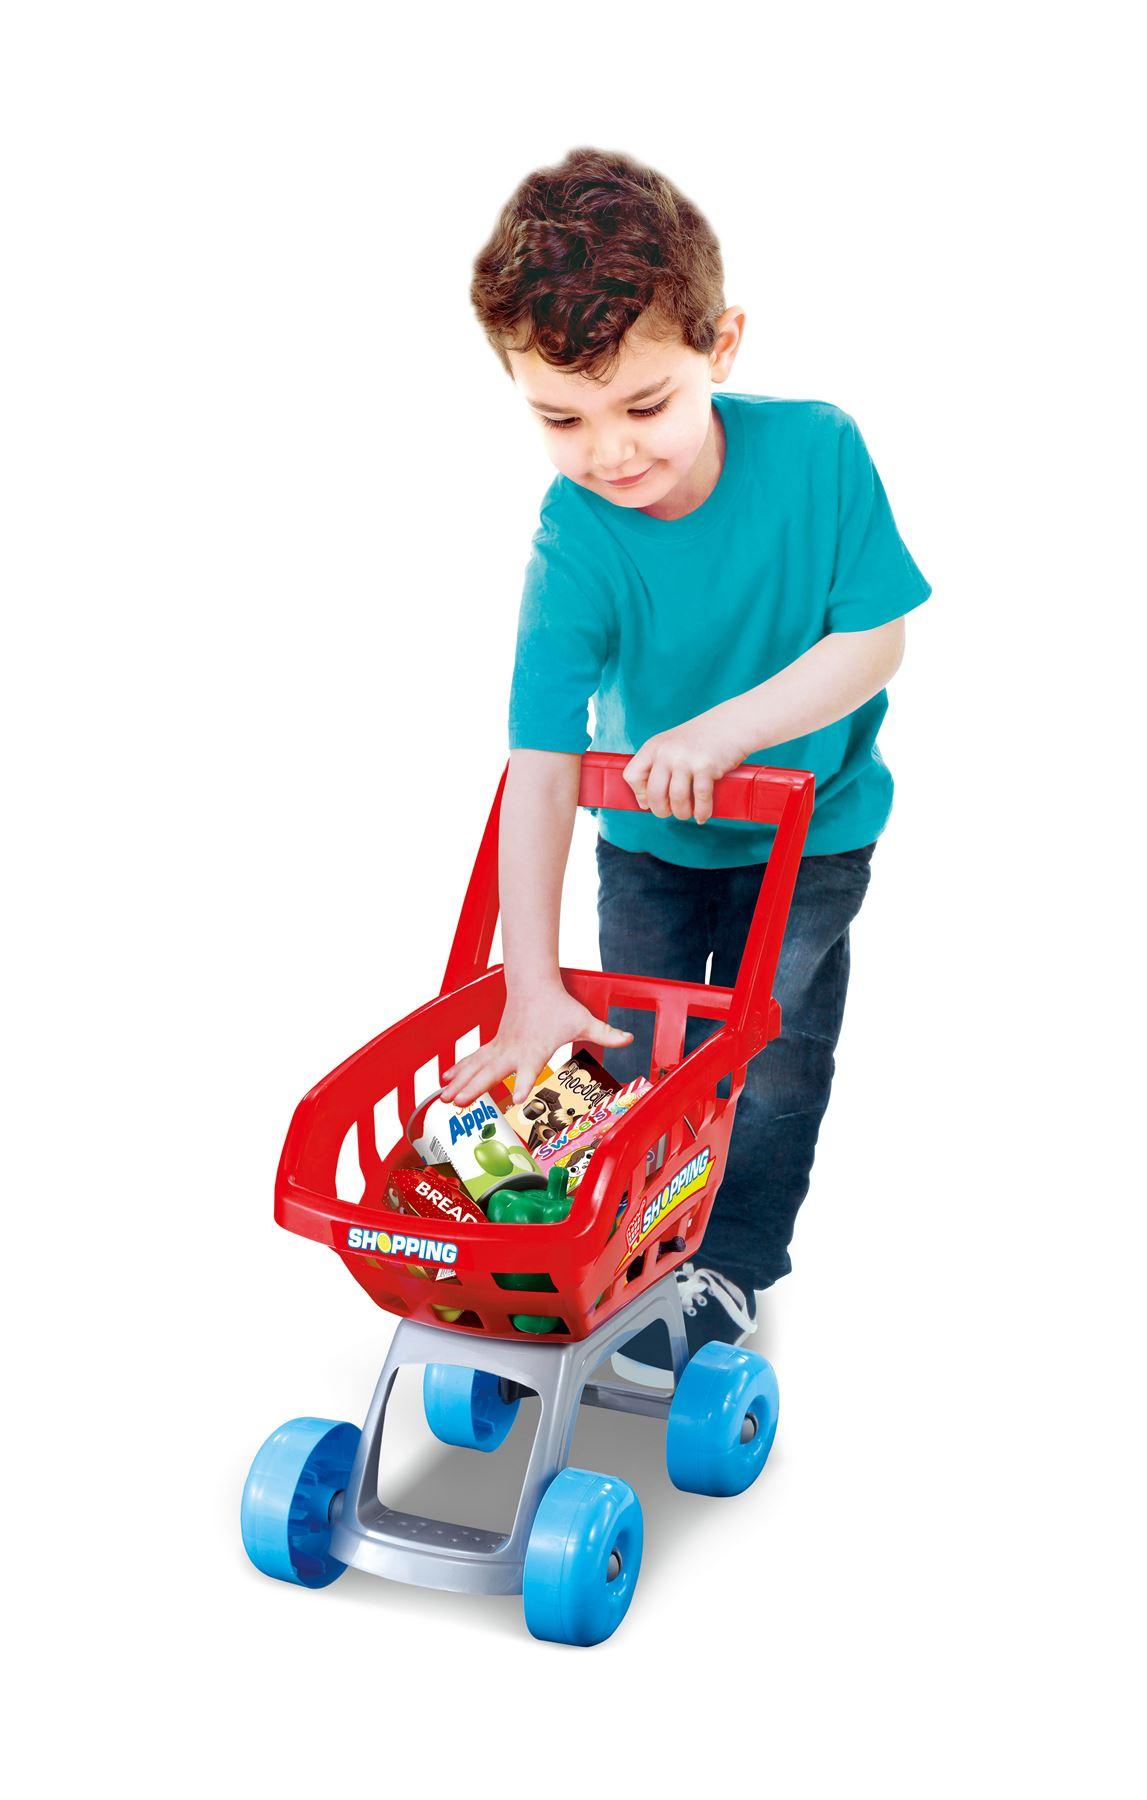 Pretend Play Toys : Vinsani kids pretend play supermarket shop toys set